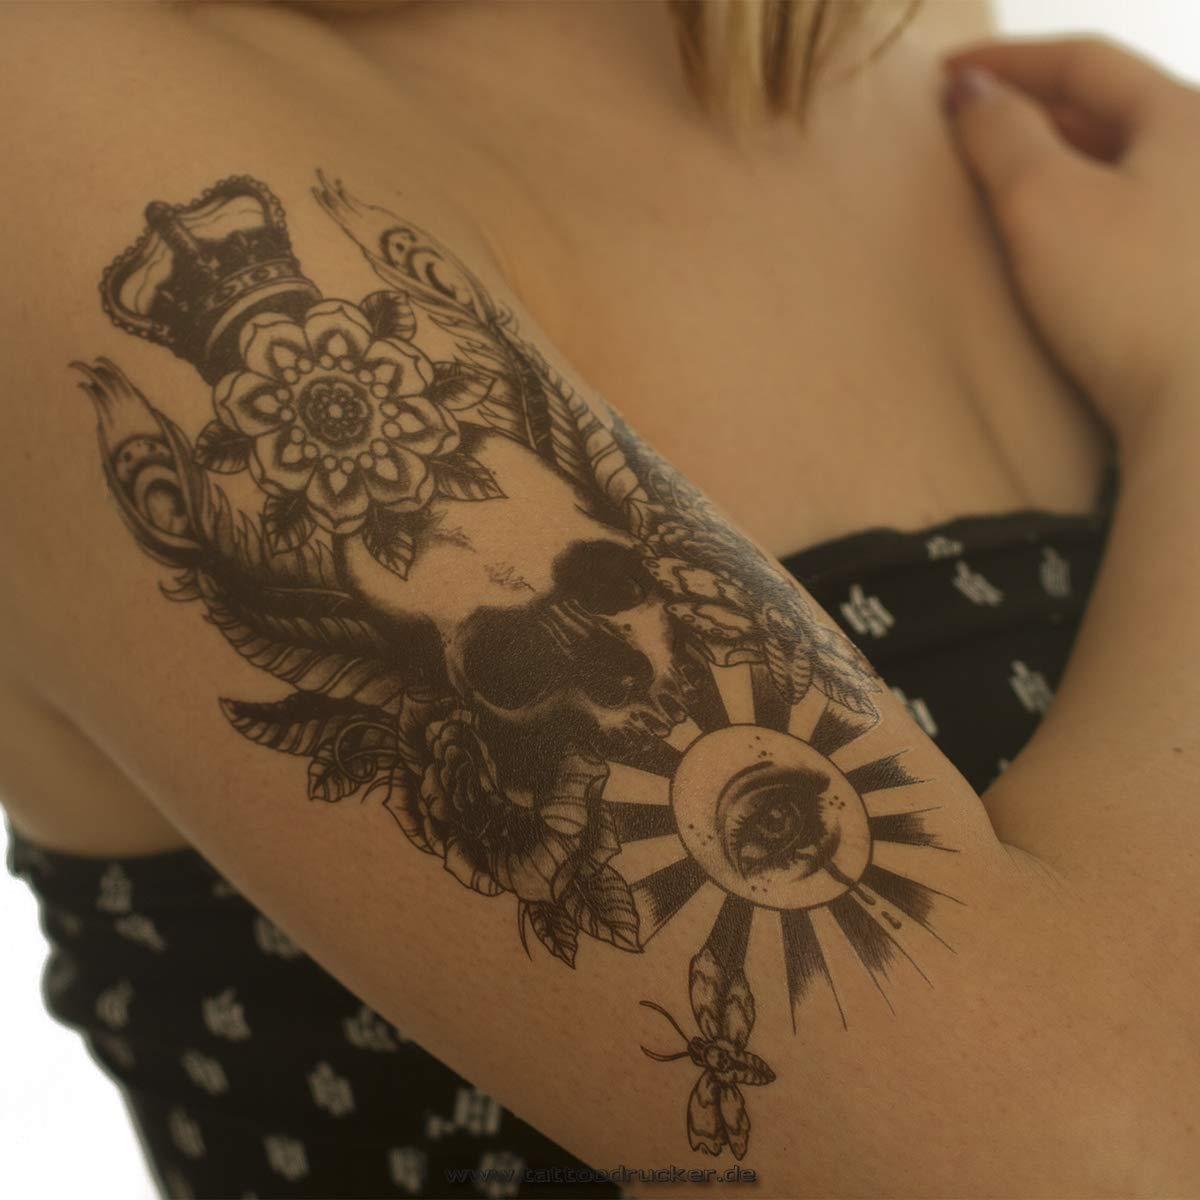 AX50 - Tatuaje Temporal, diseño de Calavera con Ojo de Corona ...